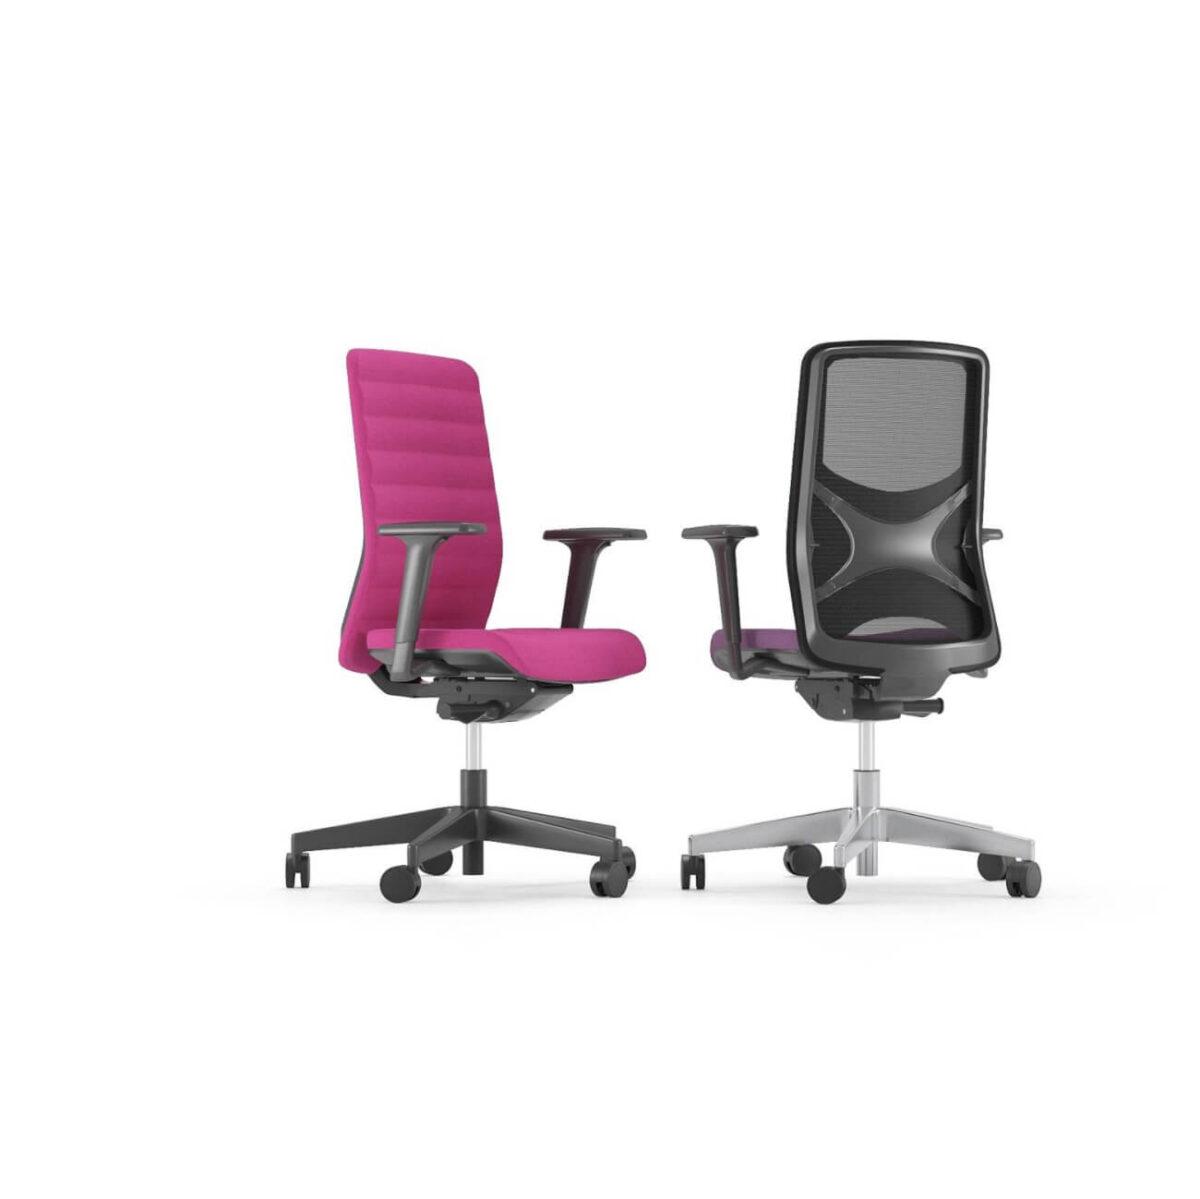 scaun birou pivotant modern